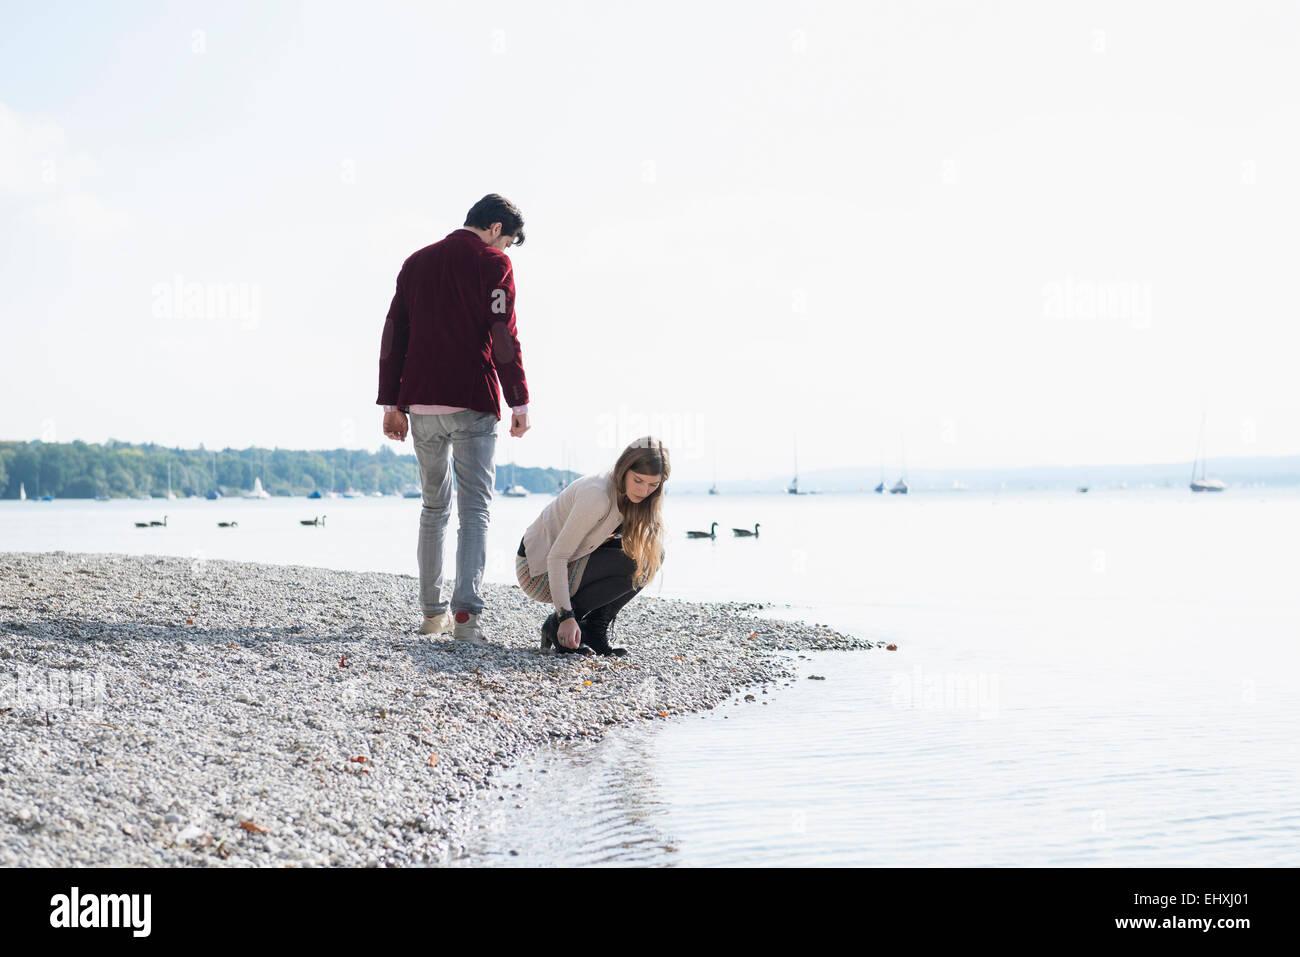 Pareja joven Lake Shore recogiendo guijarros Imagen De Stock